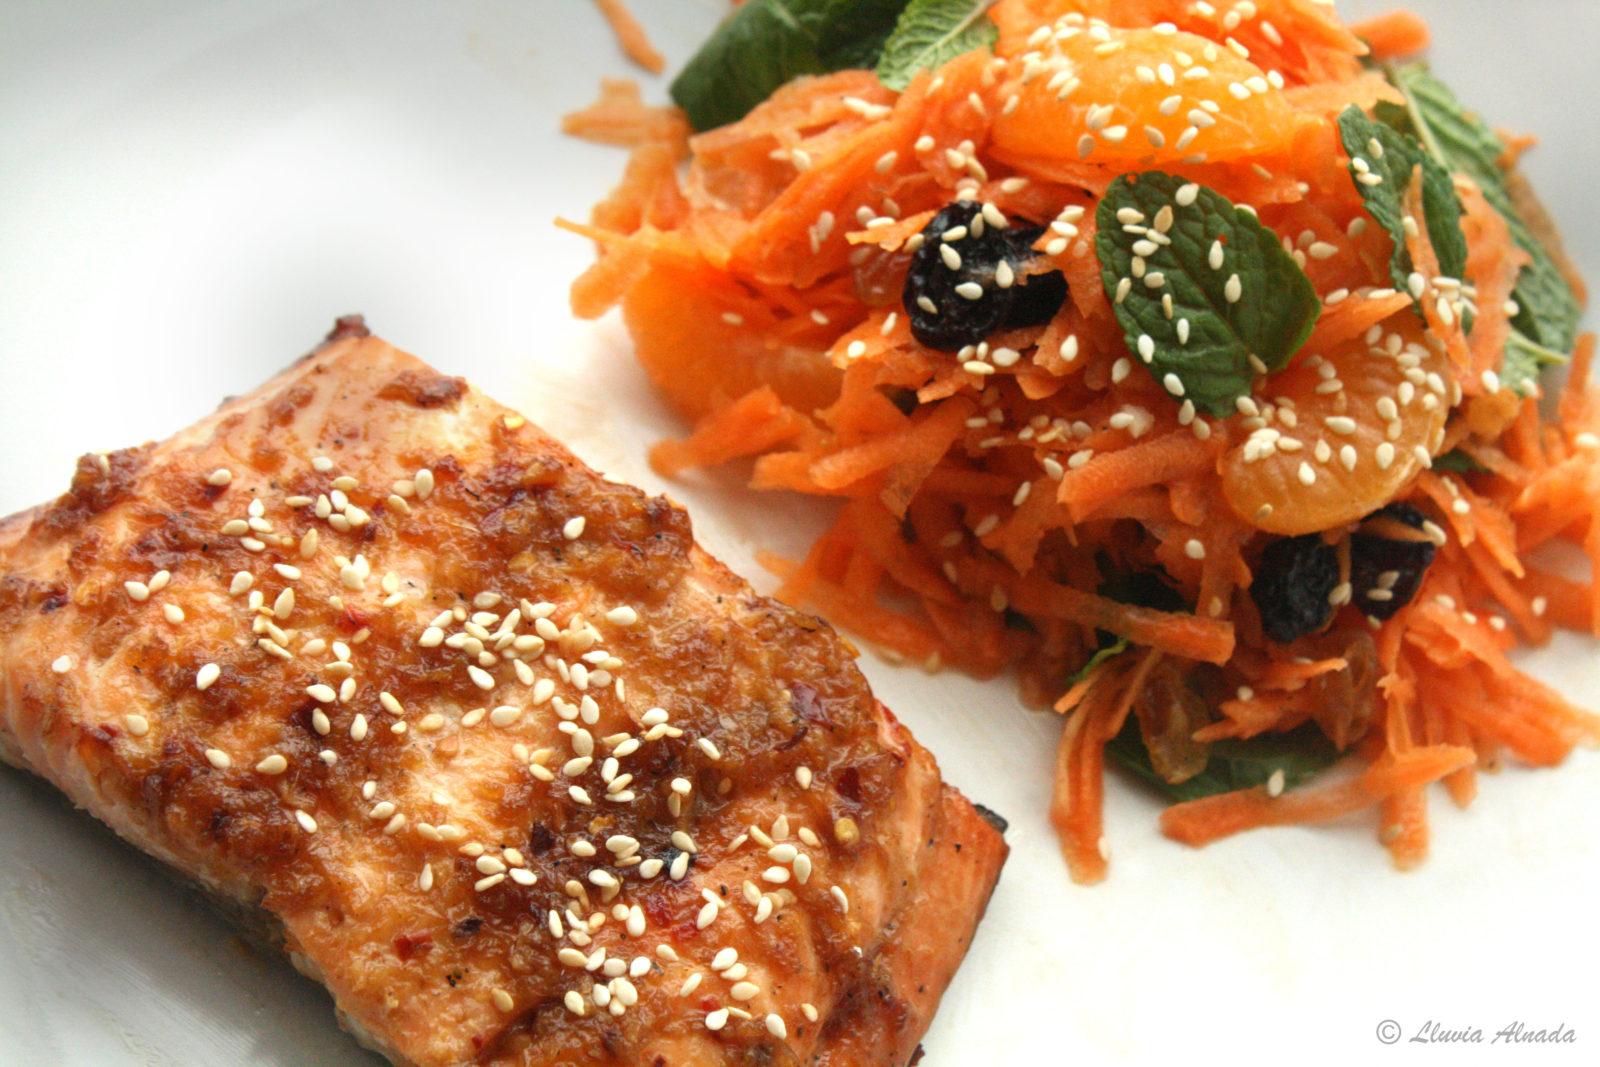 Filetes de salmón al horno con ensalada de zanahoria estilo marroquí